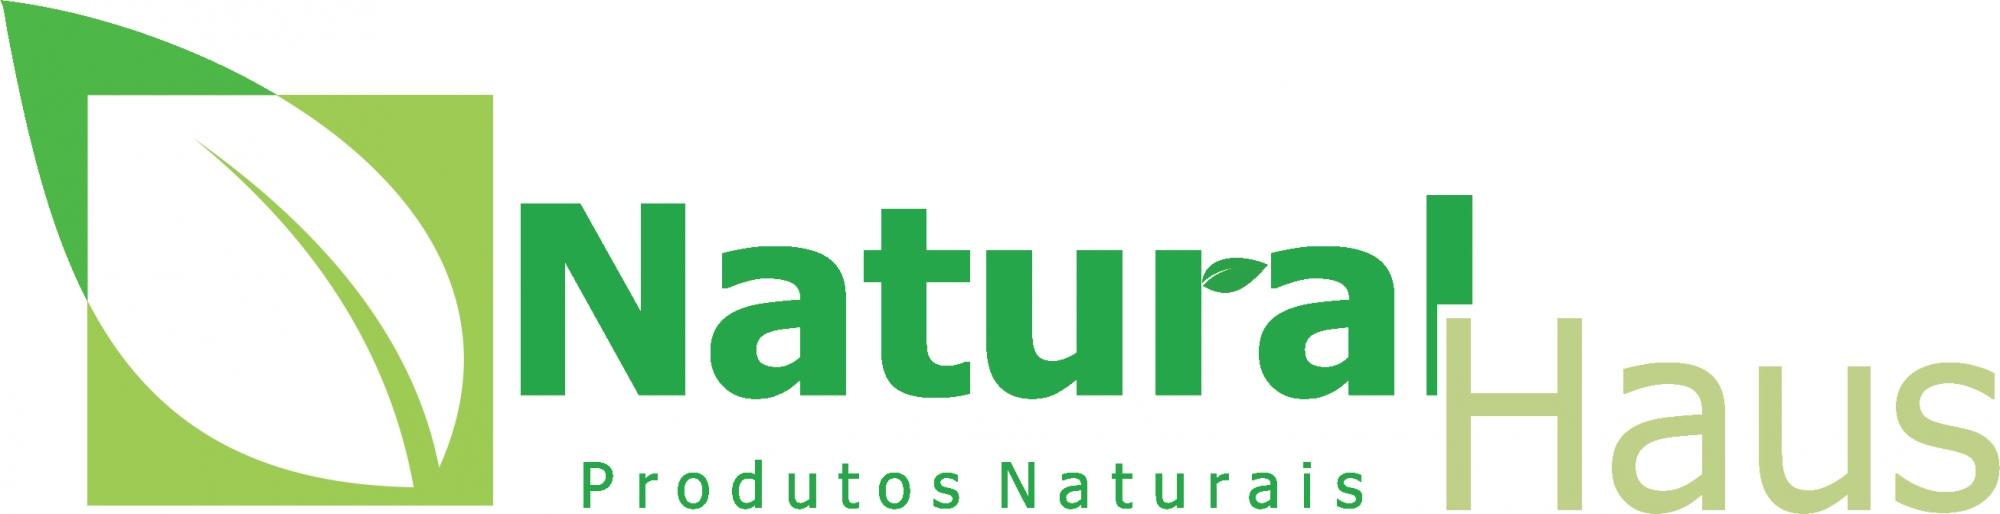 Natural Haus